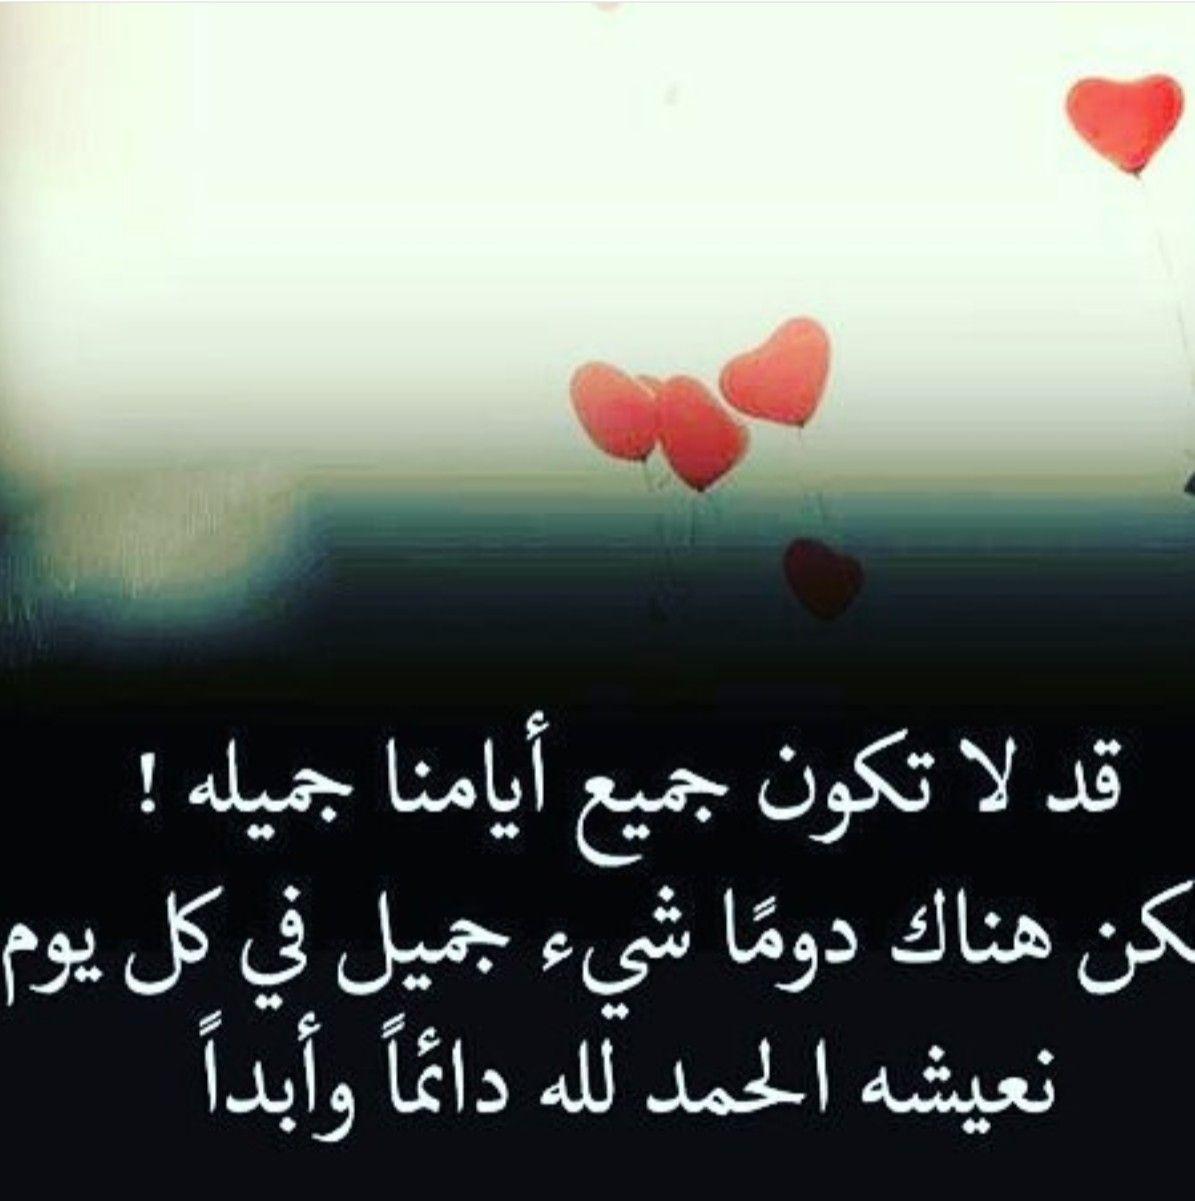 الحنان المنان Pill Arabic Calligraphy Calligraphy